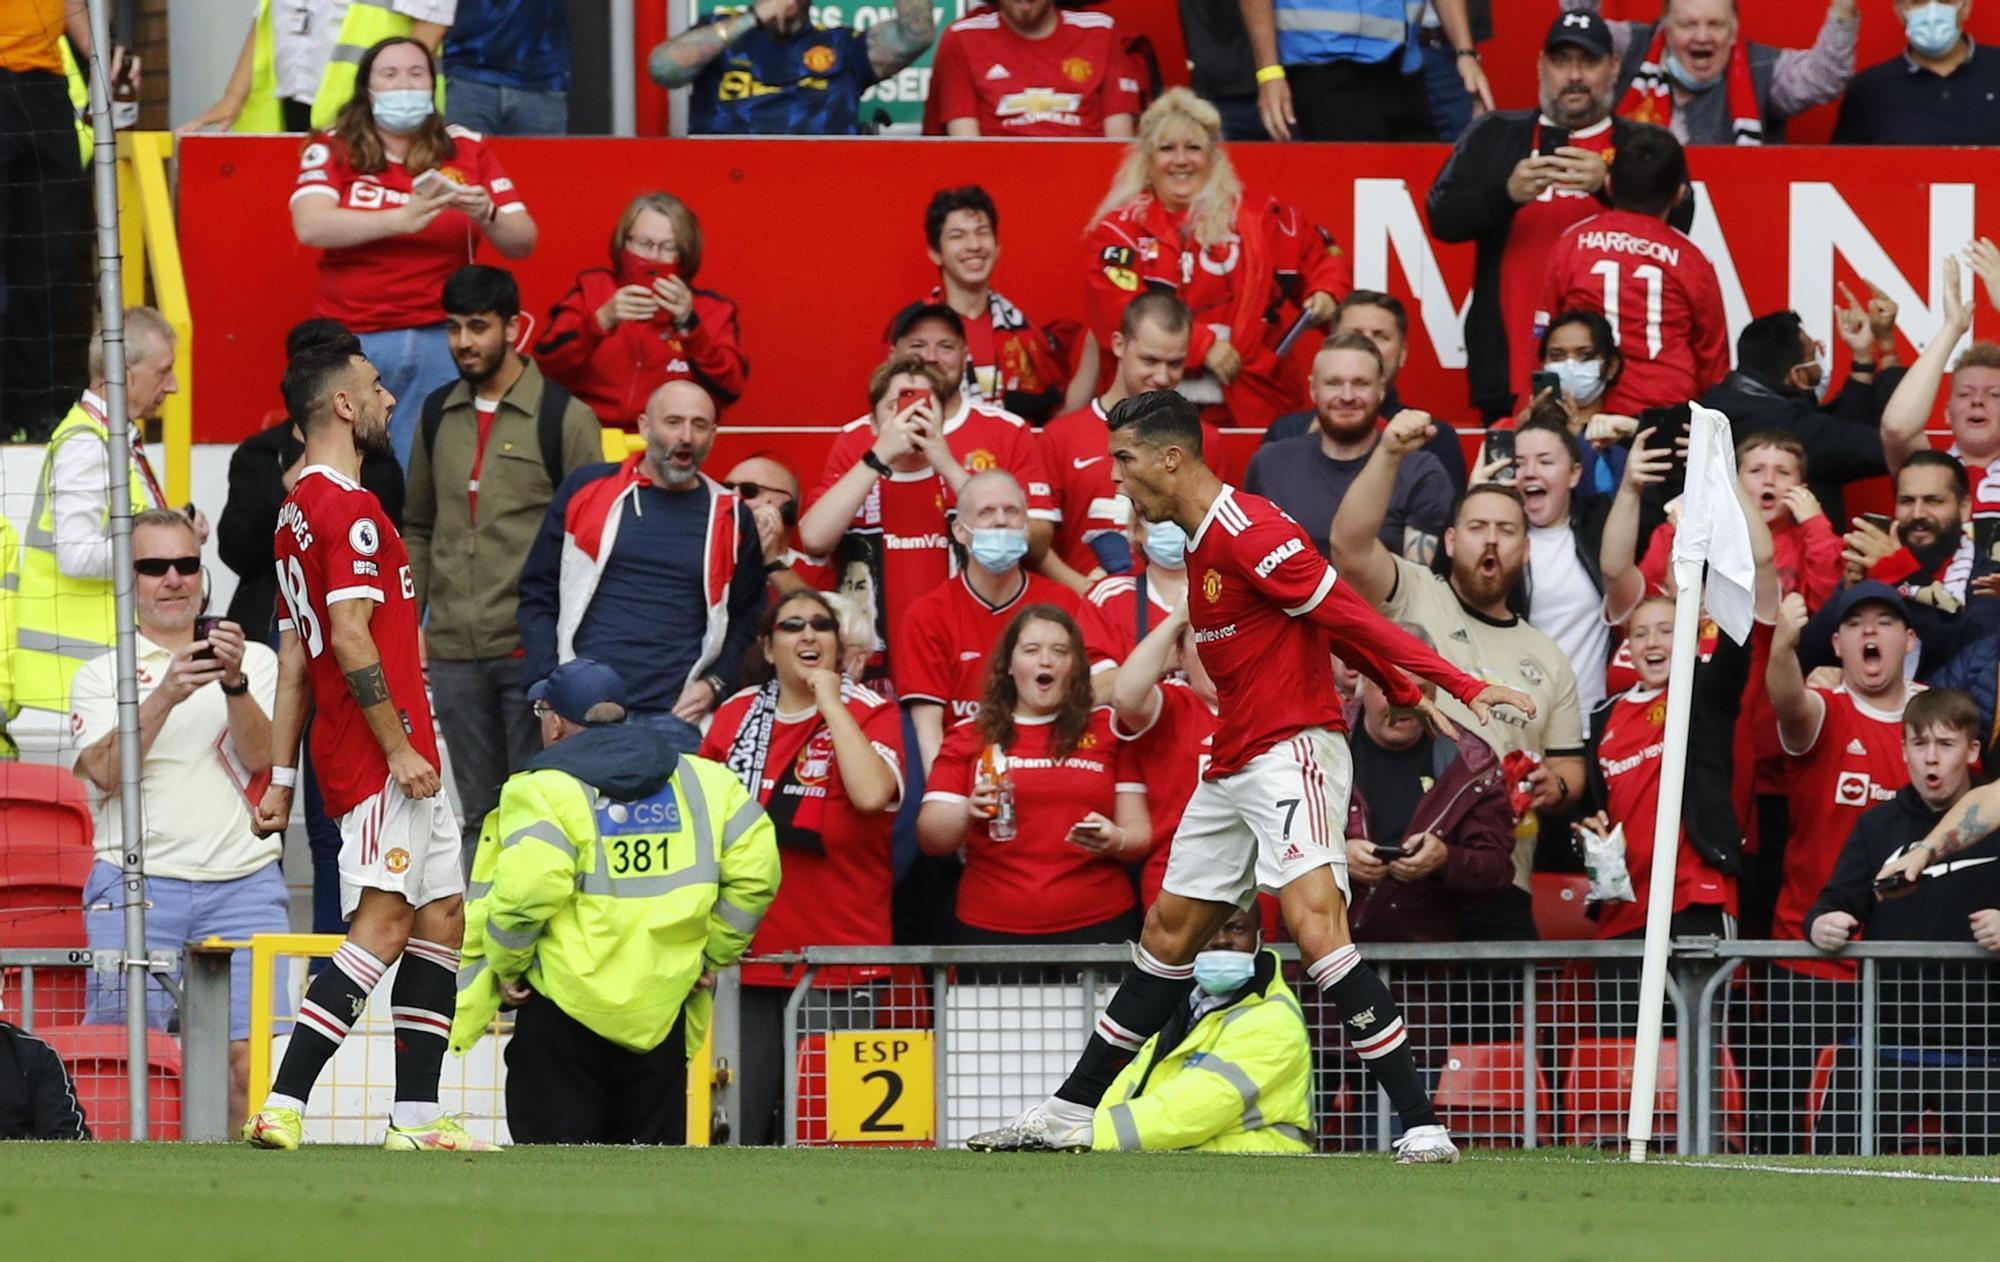 Cristiano Ronaldo se estrena de nuevo con el Manchester United